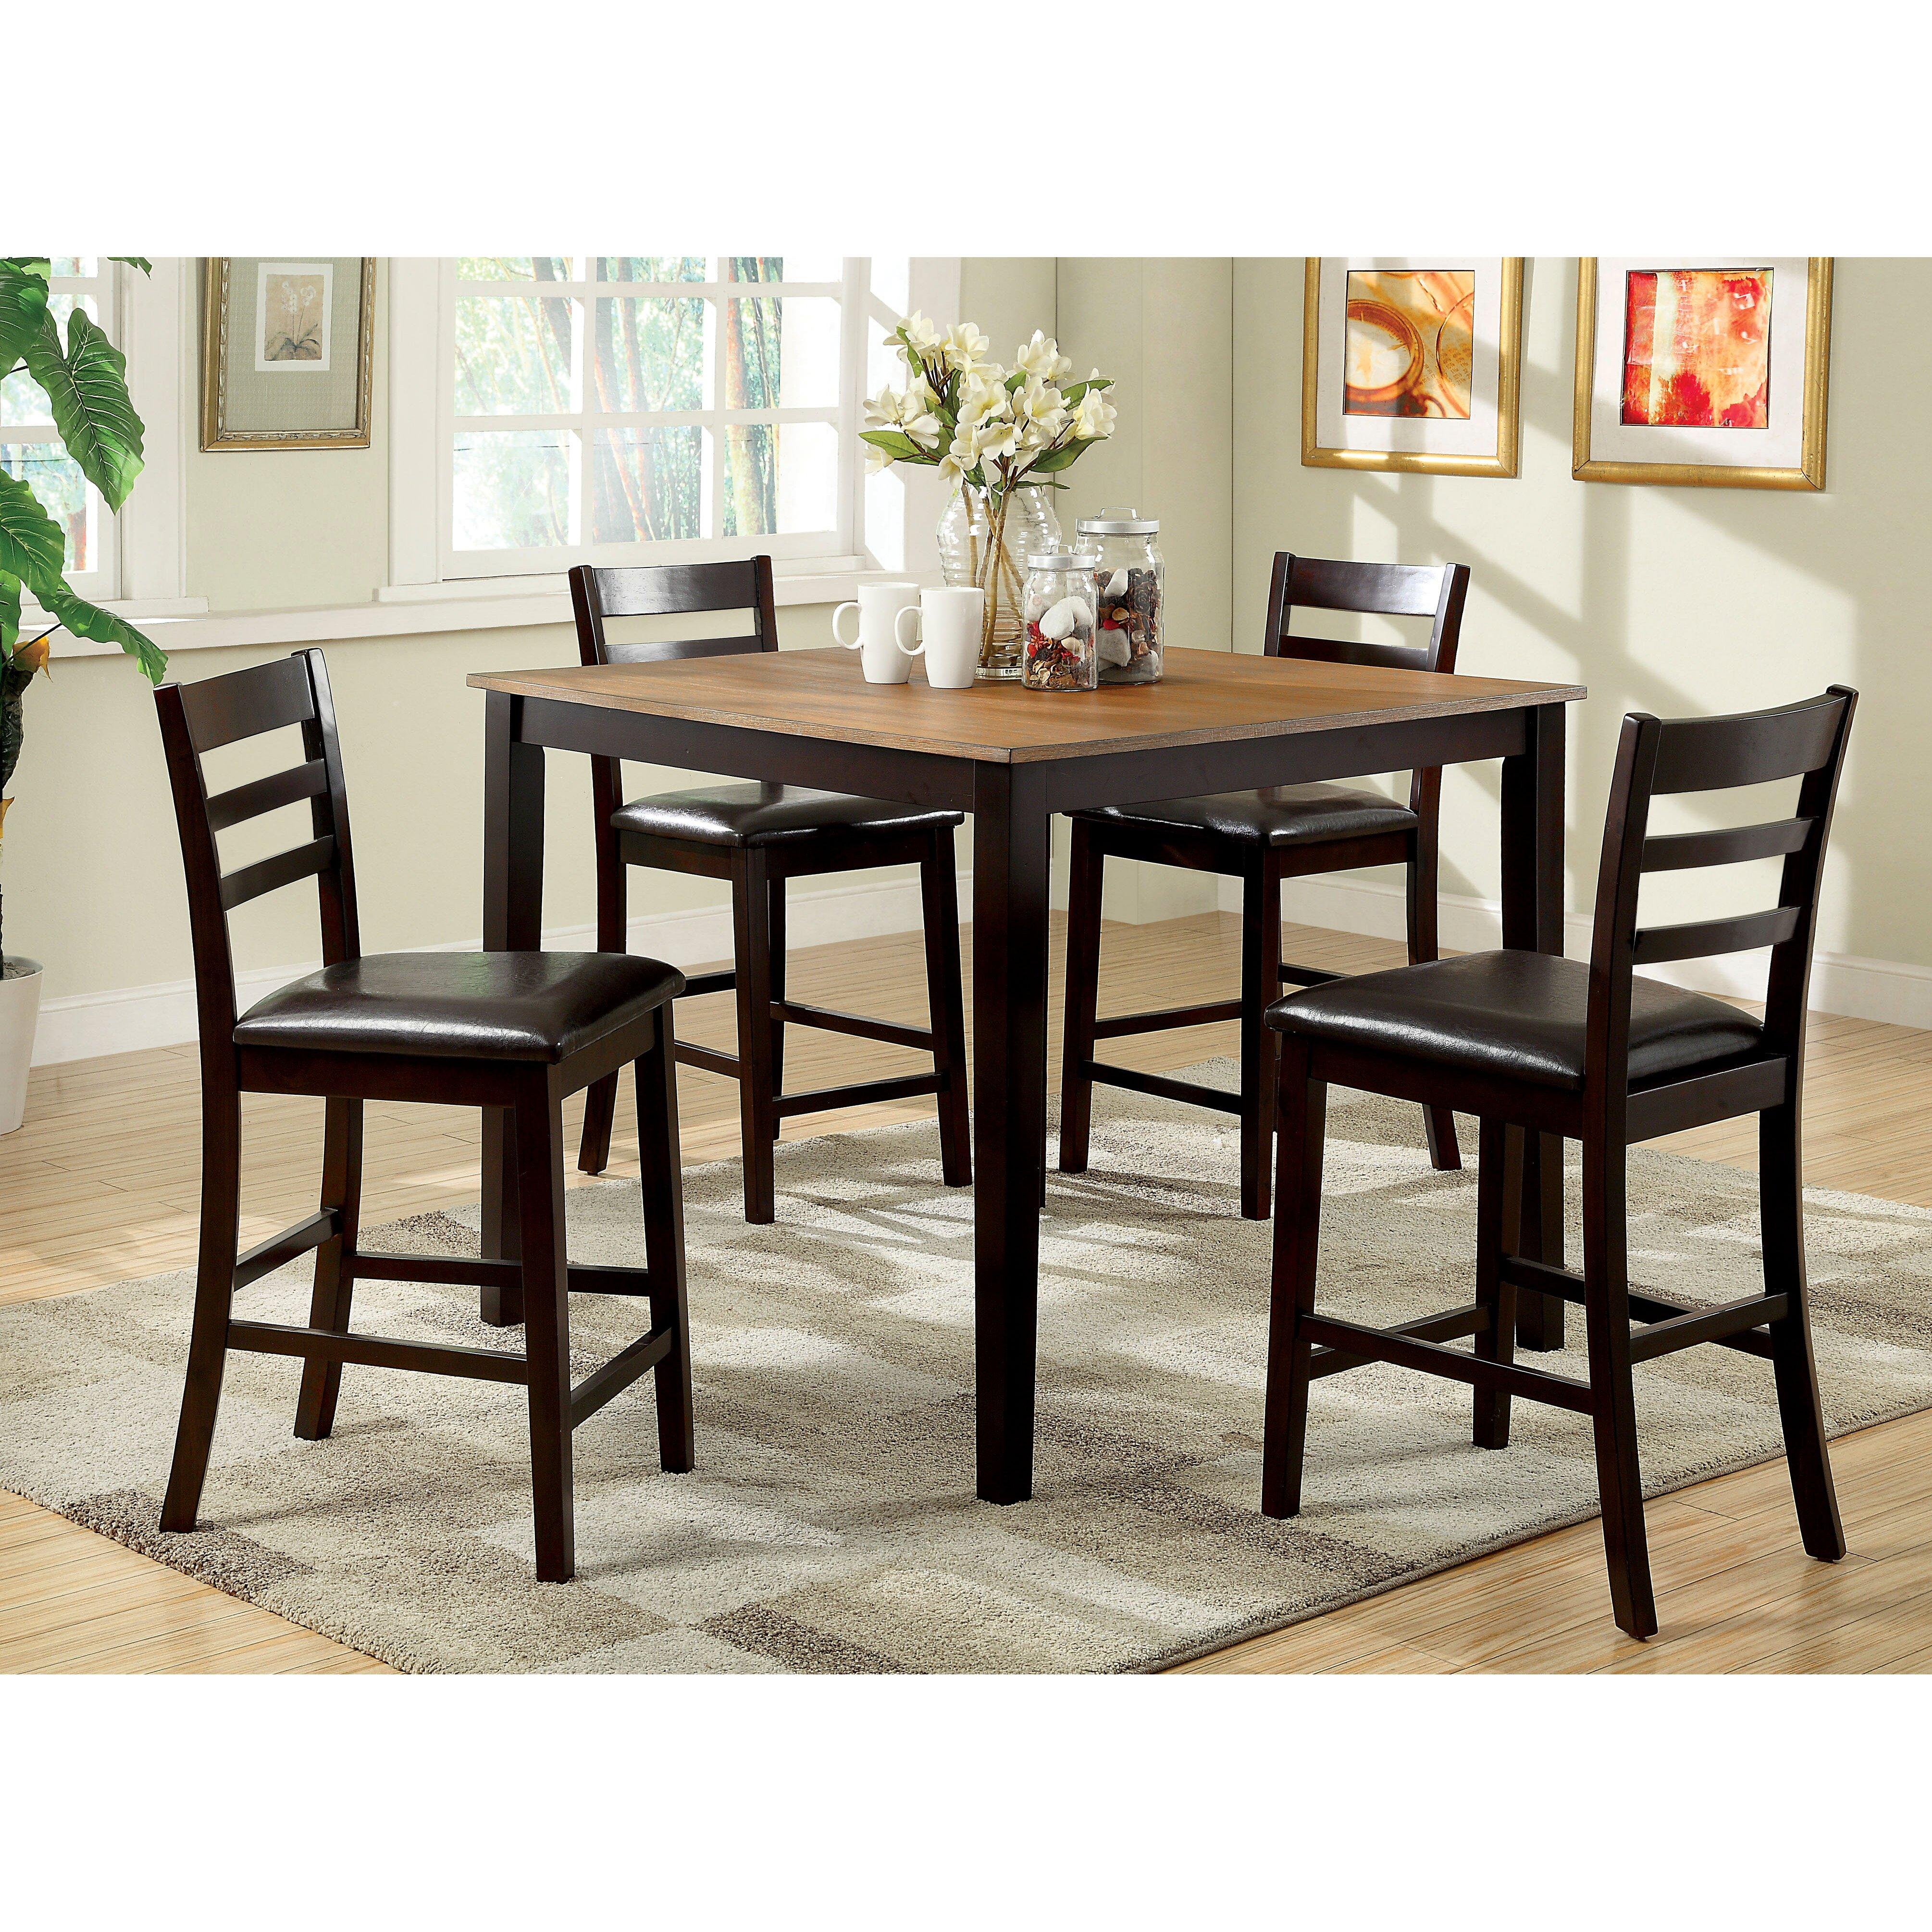 Hokku designs barcelona 5 piece dining set reviews for Hokku designs dining room furniture